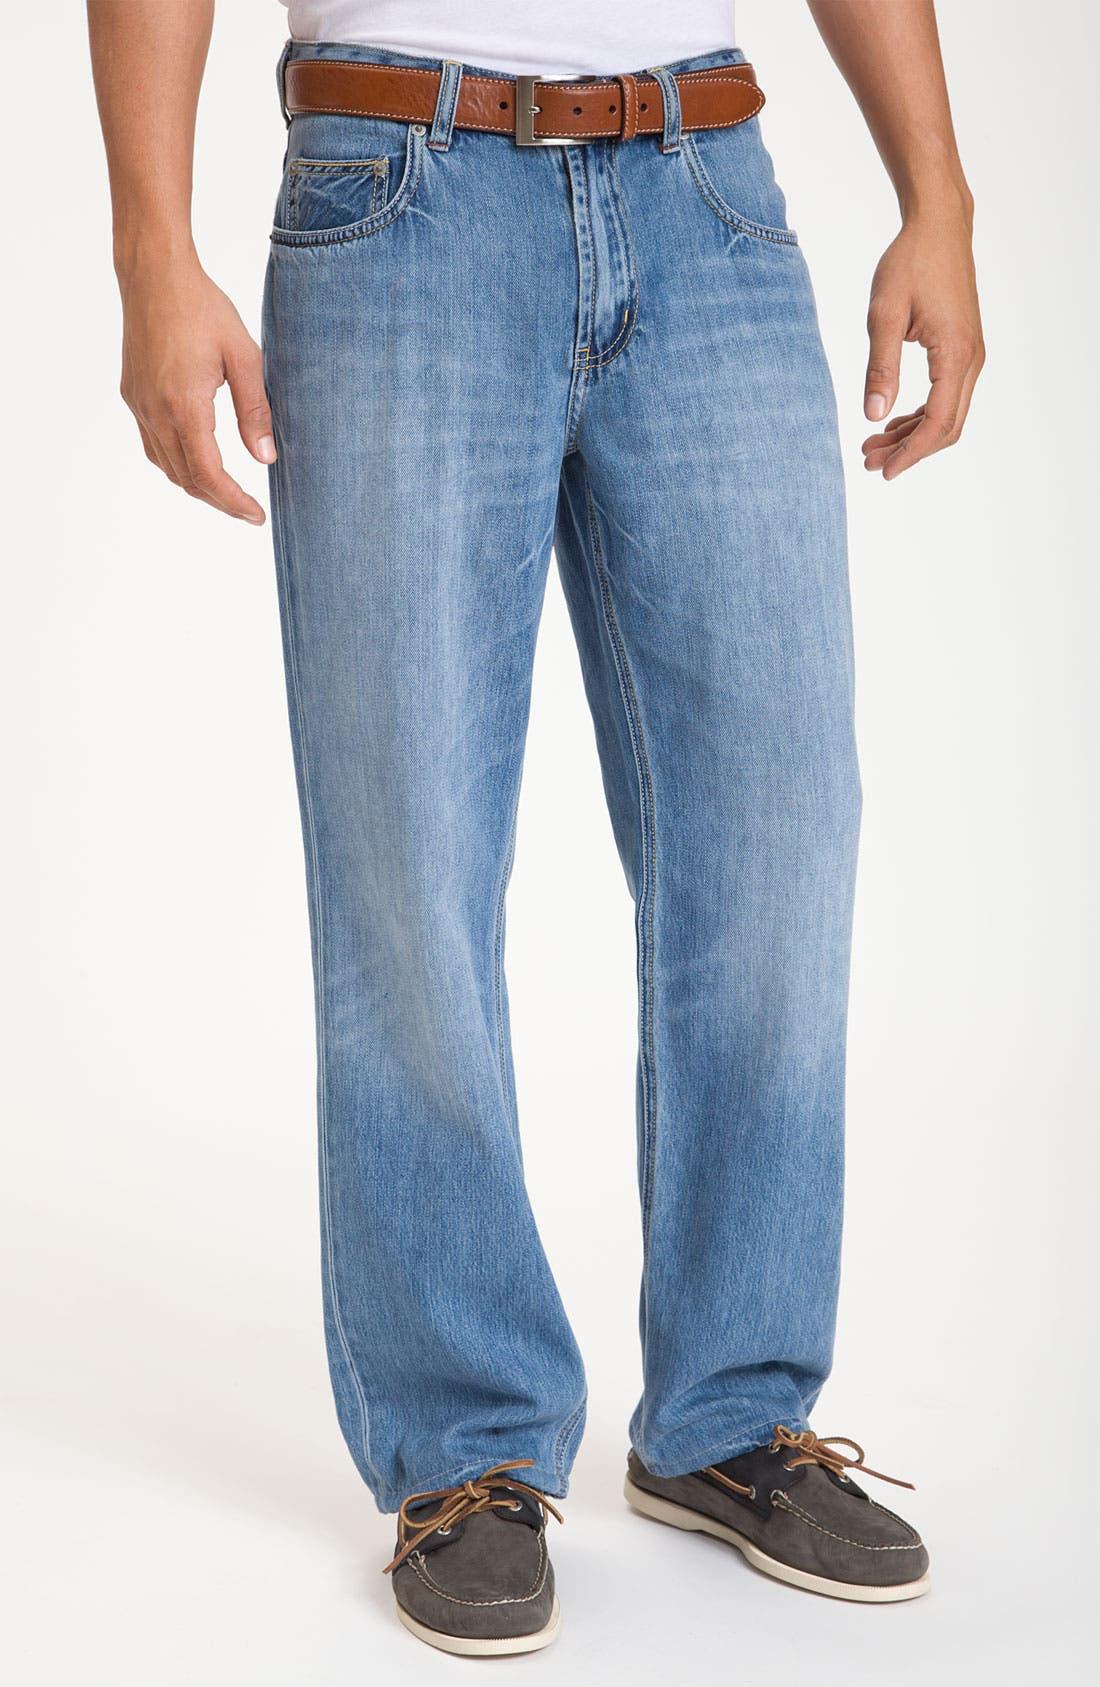 Main Image - Tommy Bahama Denim 'Island Ease' Straight Leg Jeans (Vintage Light)